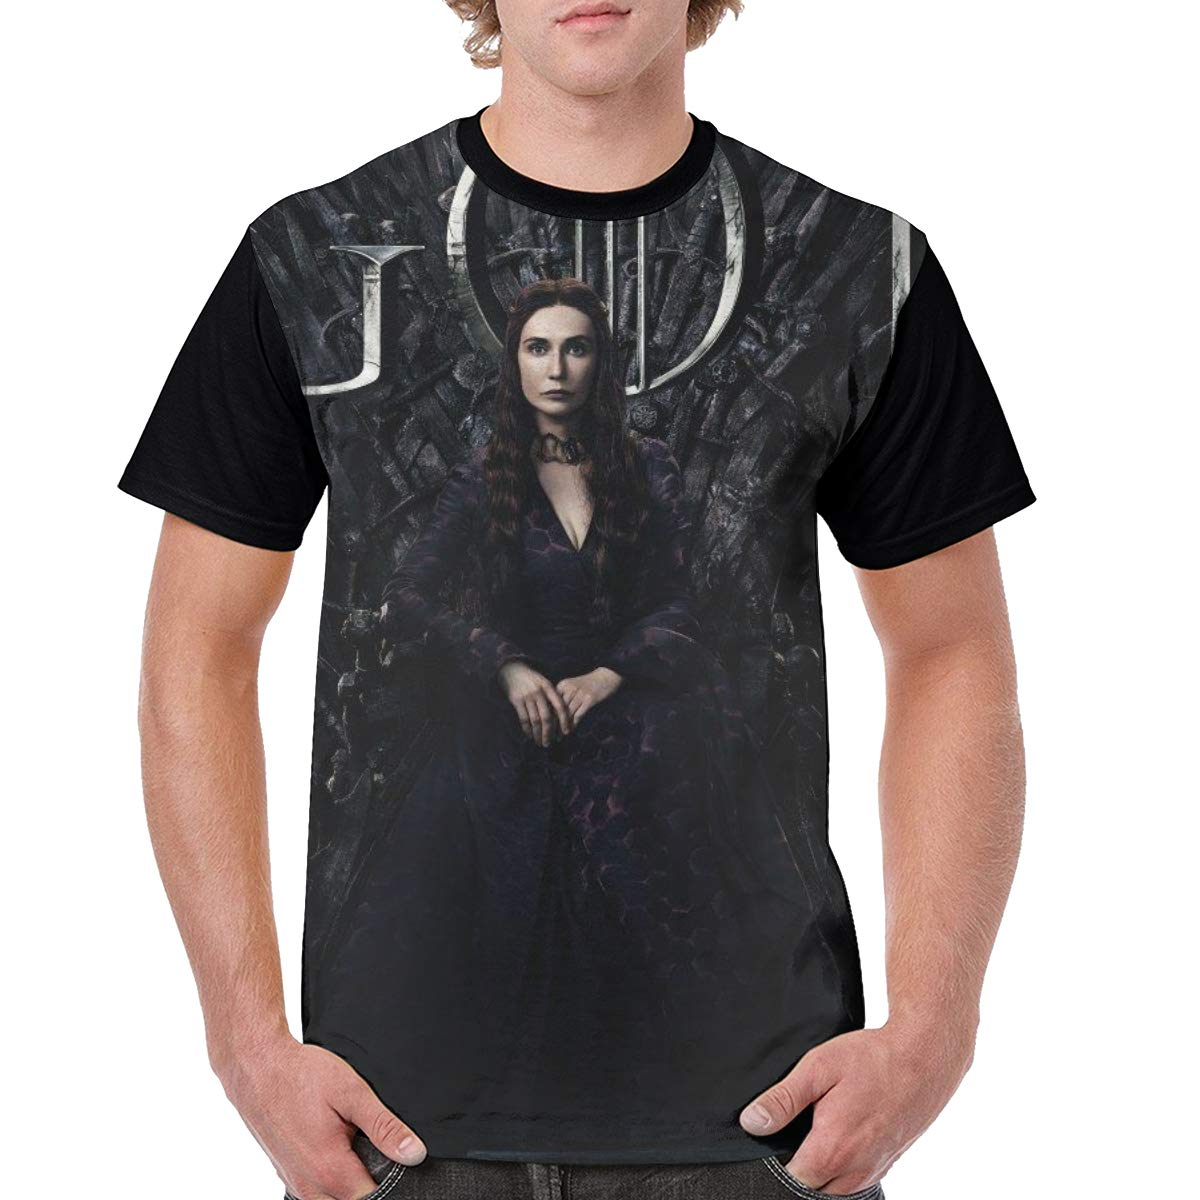 SHENGN Custom Man Game of Thrones Printing T Shirt